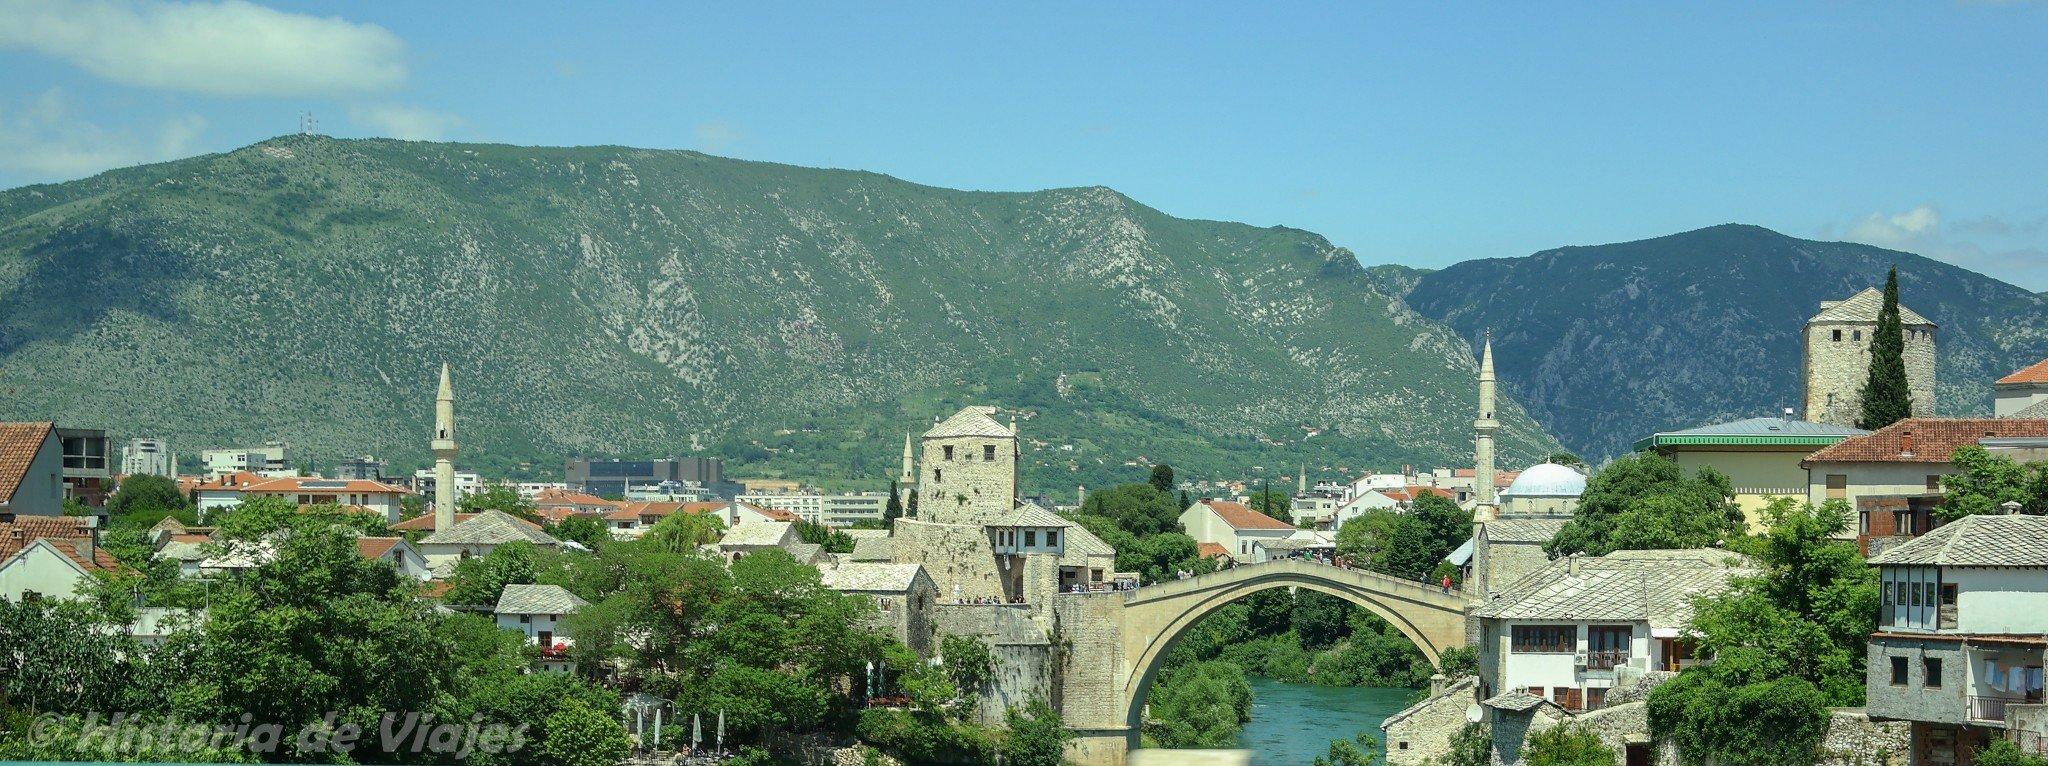 Mostar_9